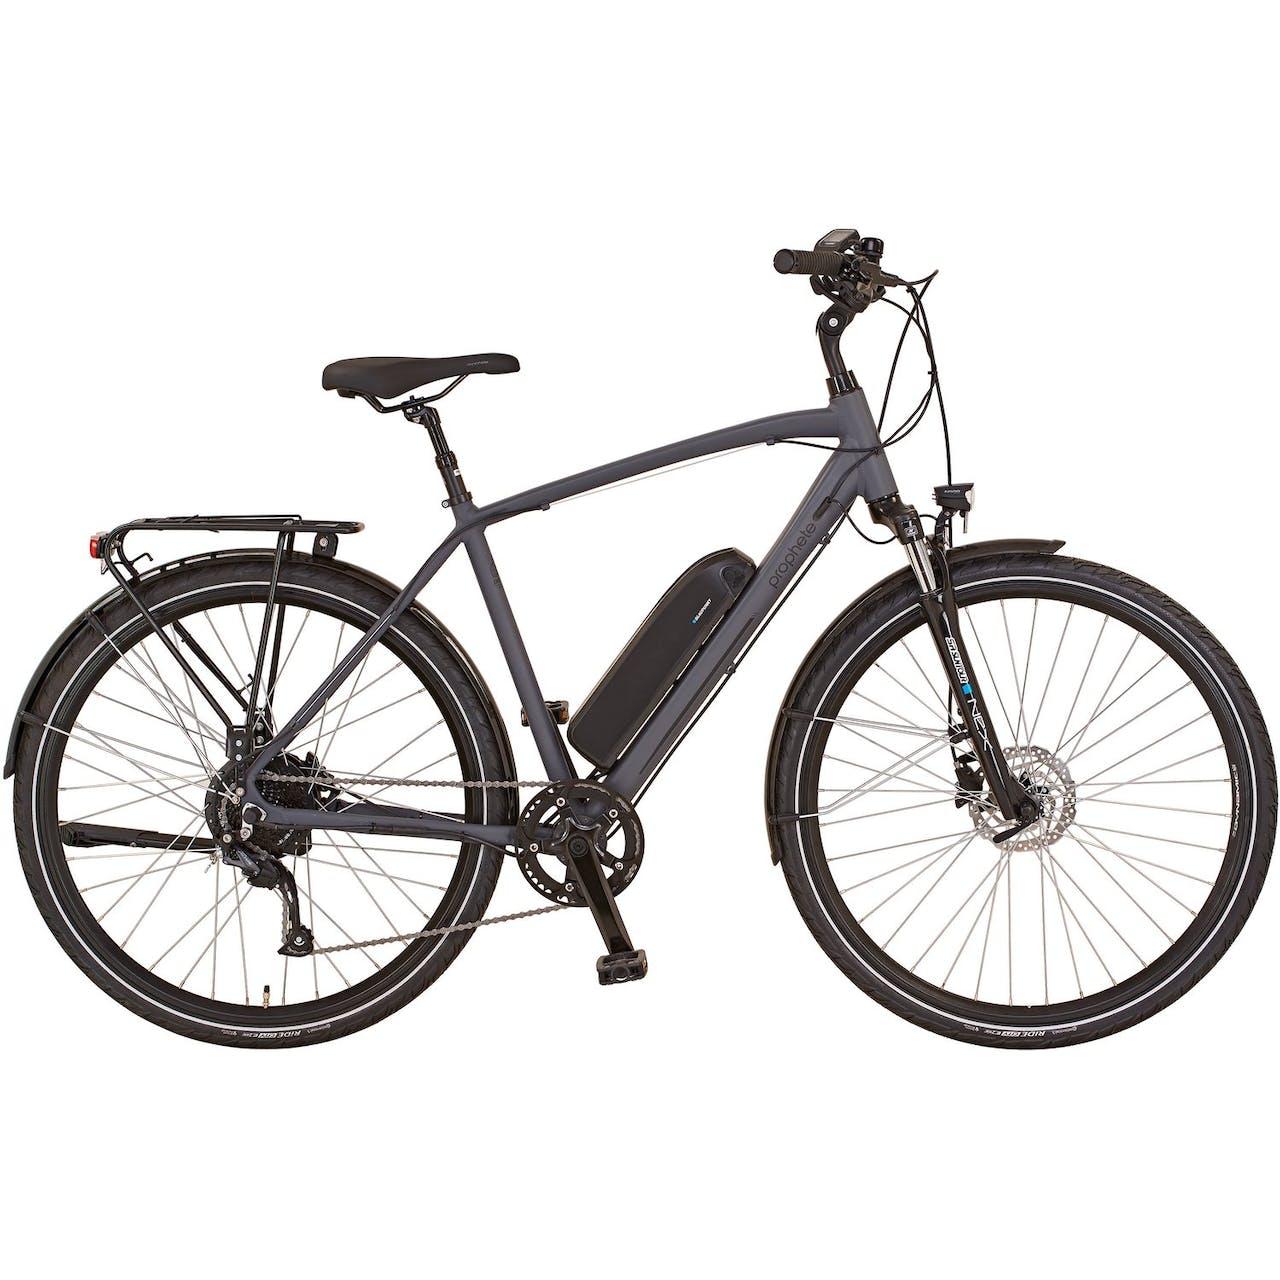 "Prophete E-Bike Herren Trekking-Fahrrad 28"" Entdecker 20.EST.10"